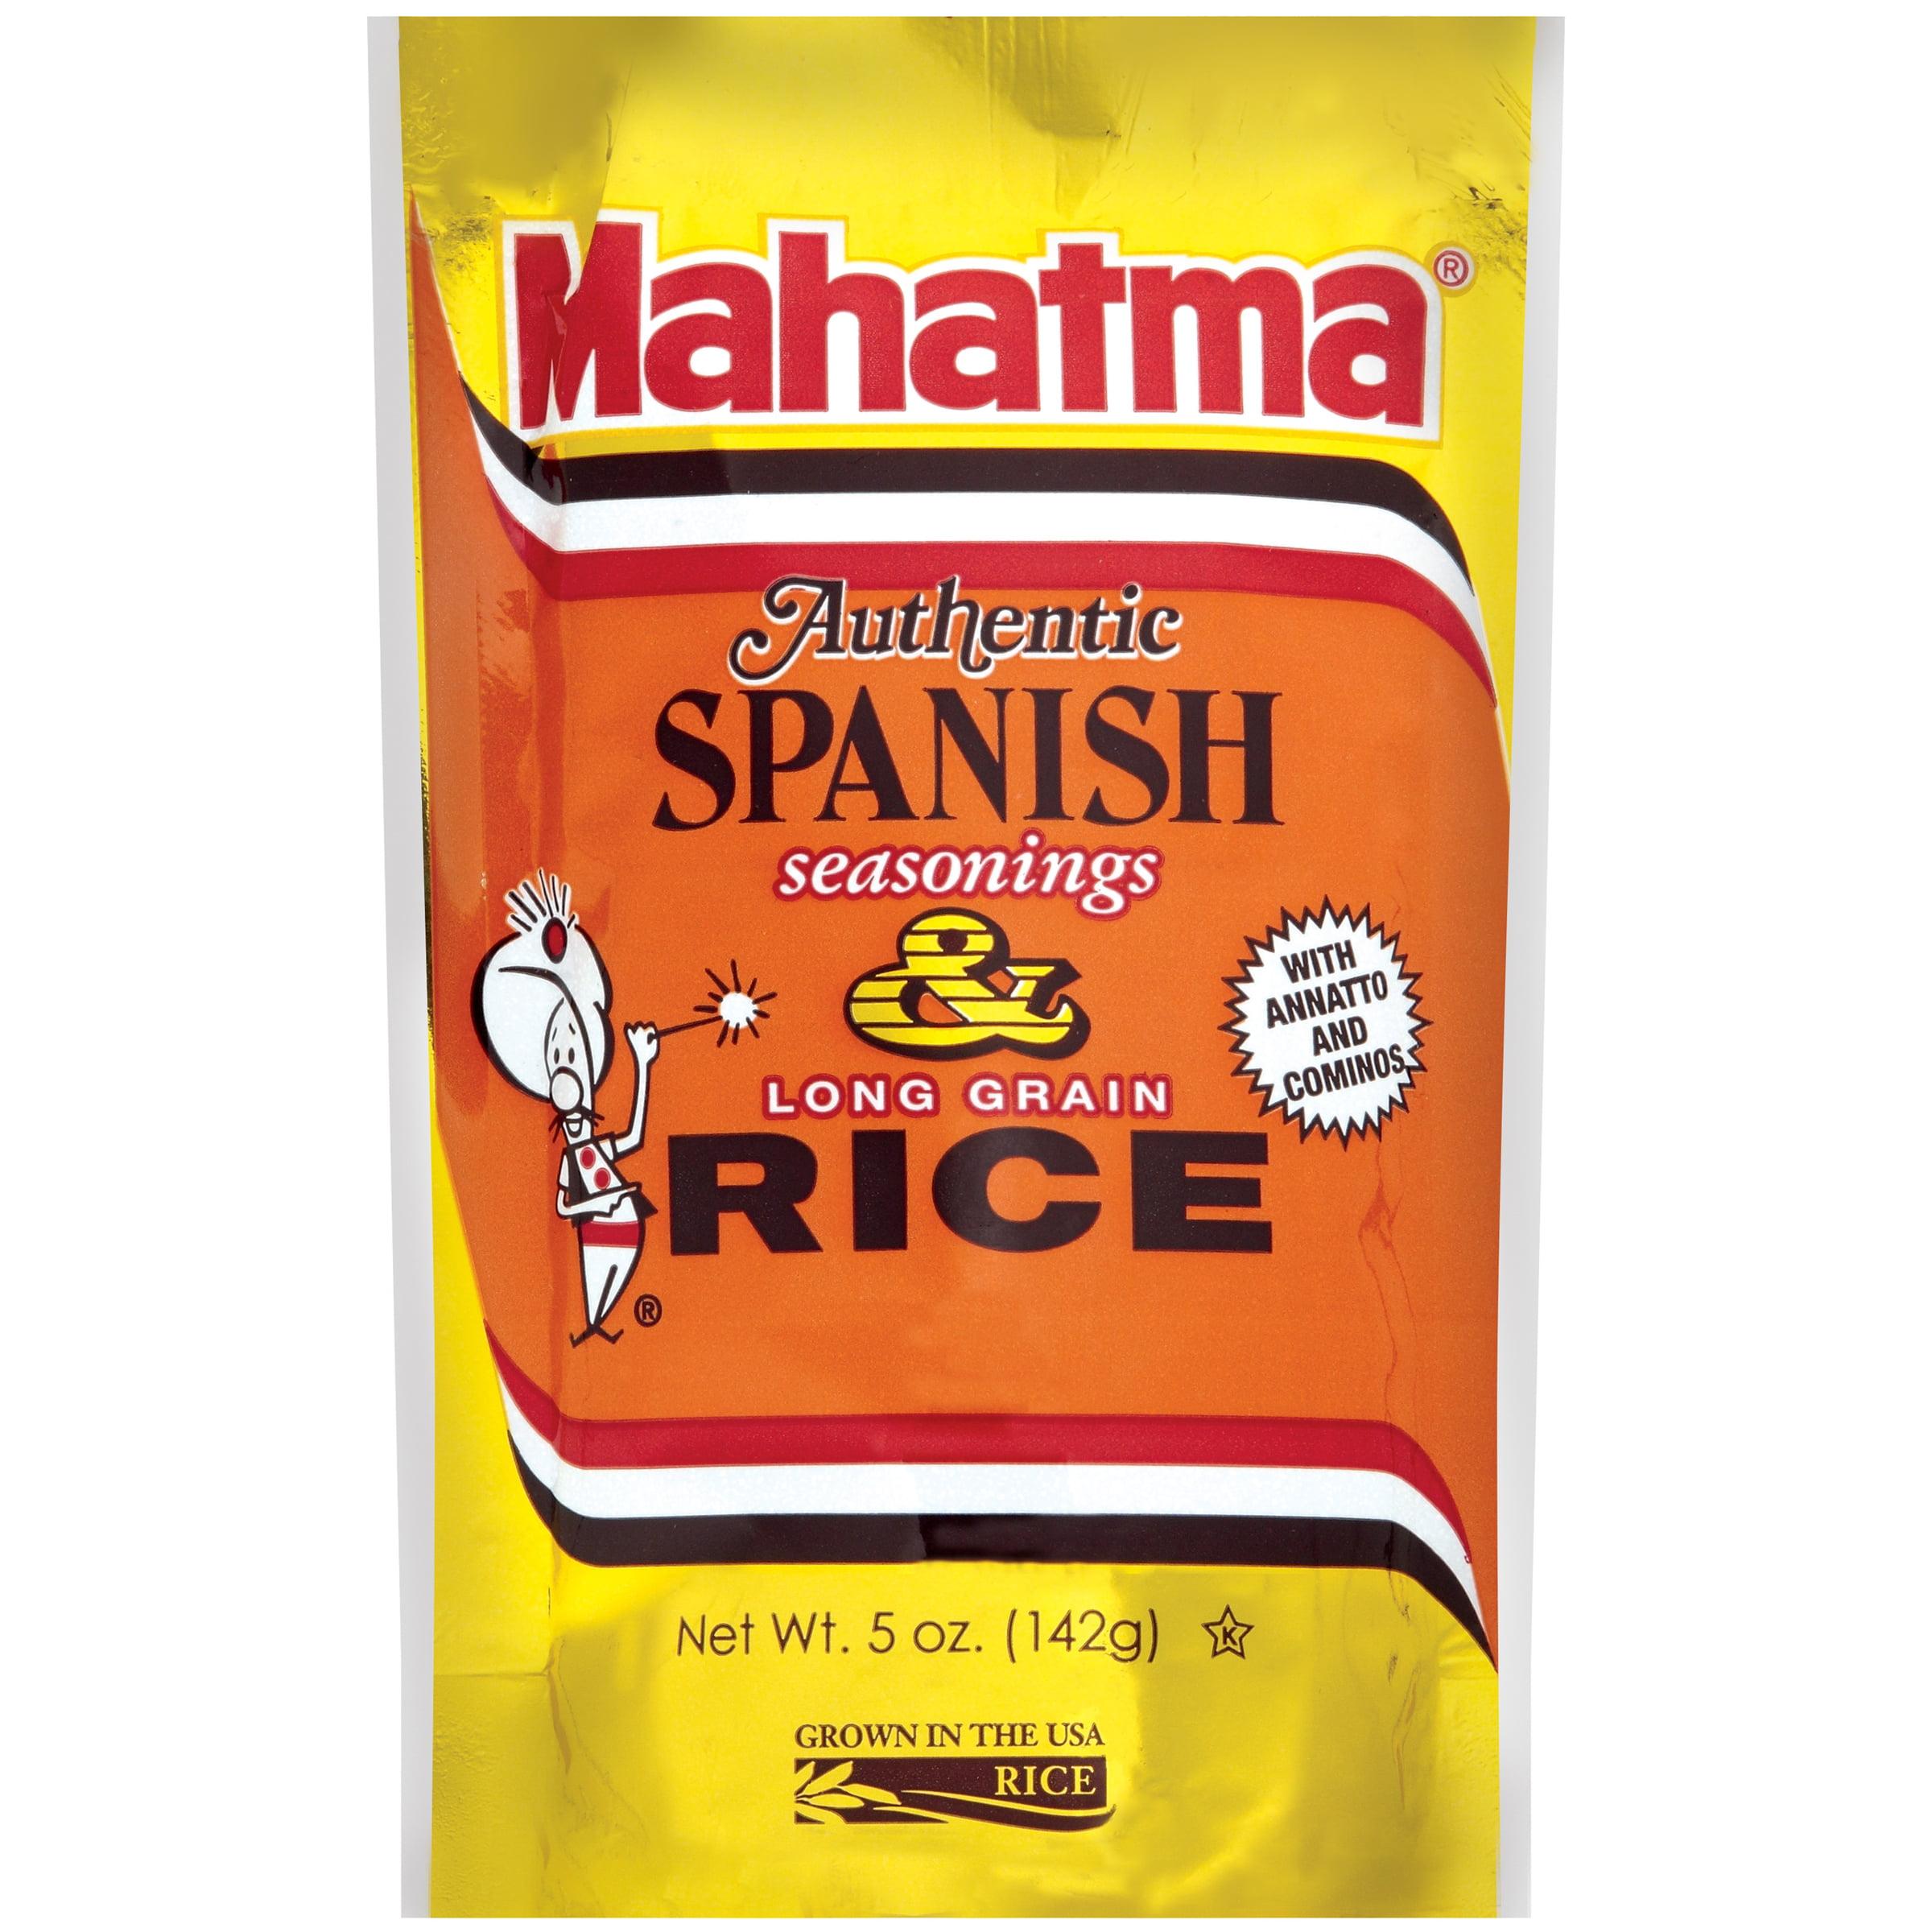 Mahatma® Authentic Spanish Seasonings & Long Grain Rice 5 oz.